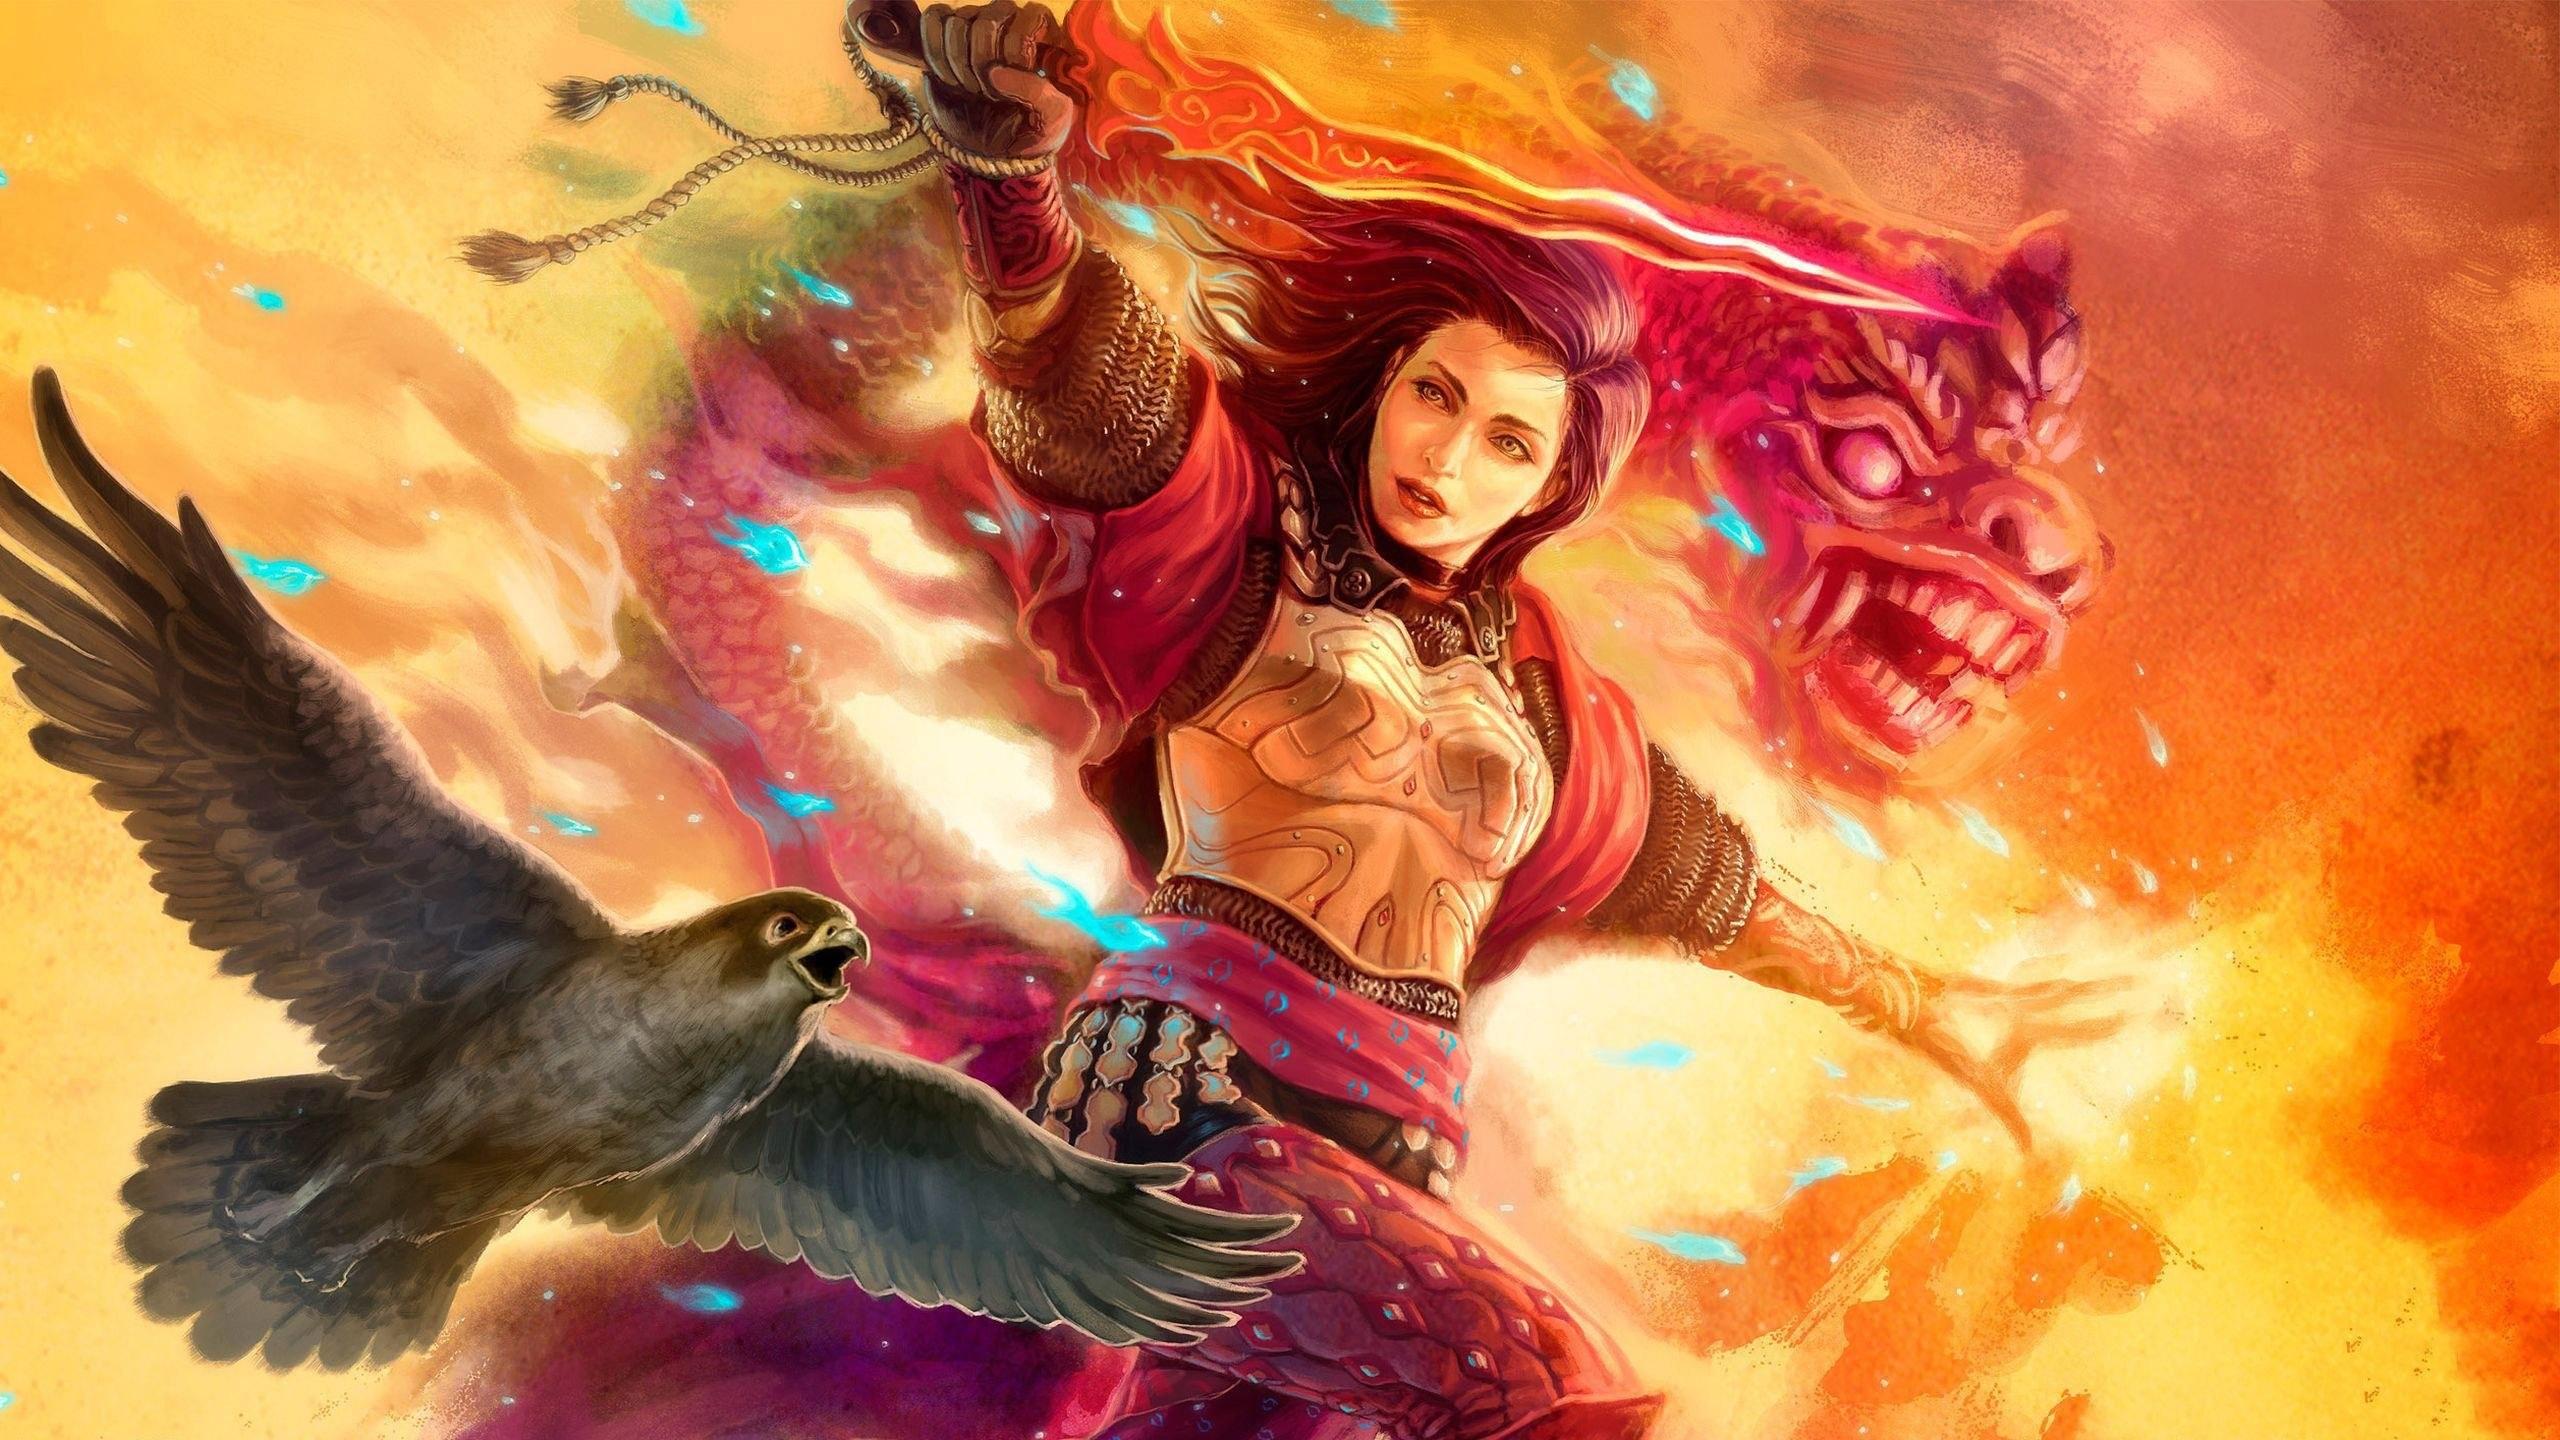 Woman fantasy animal warrior with falcon magic dragon wallpaper      990595   WallpaperUP